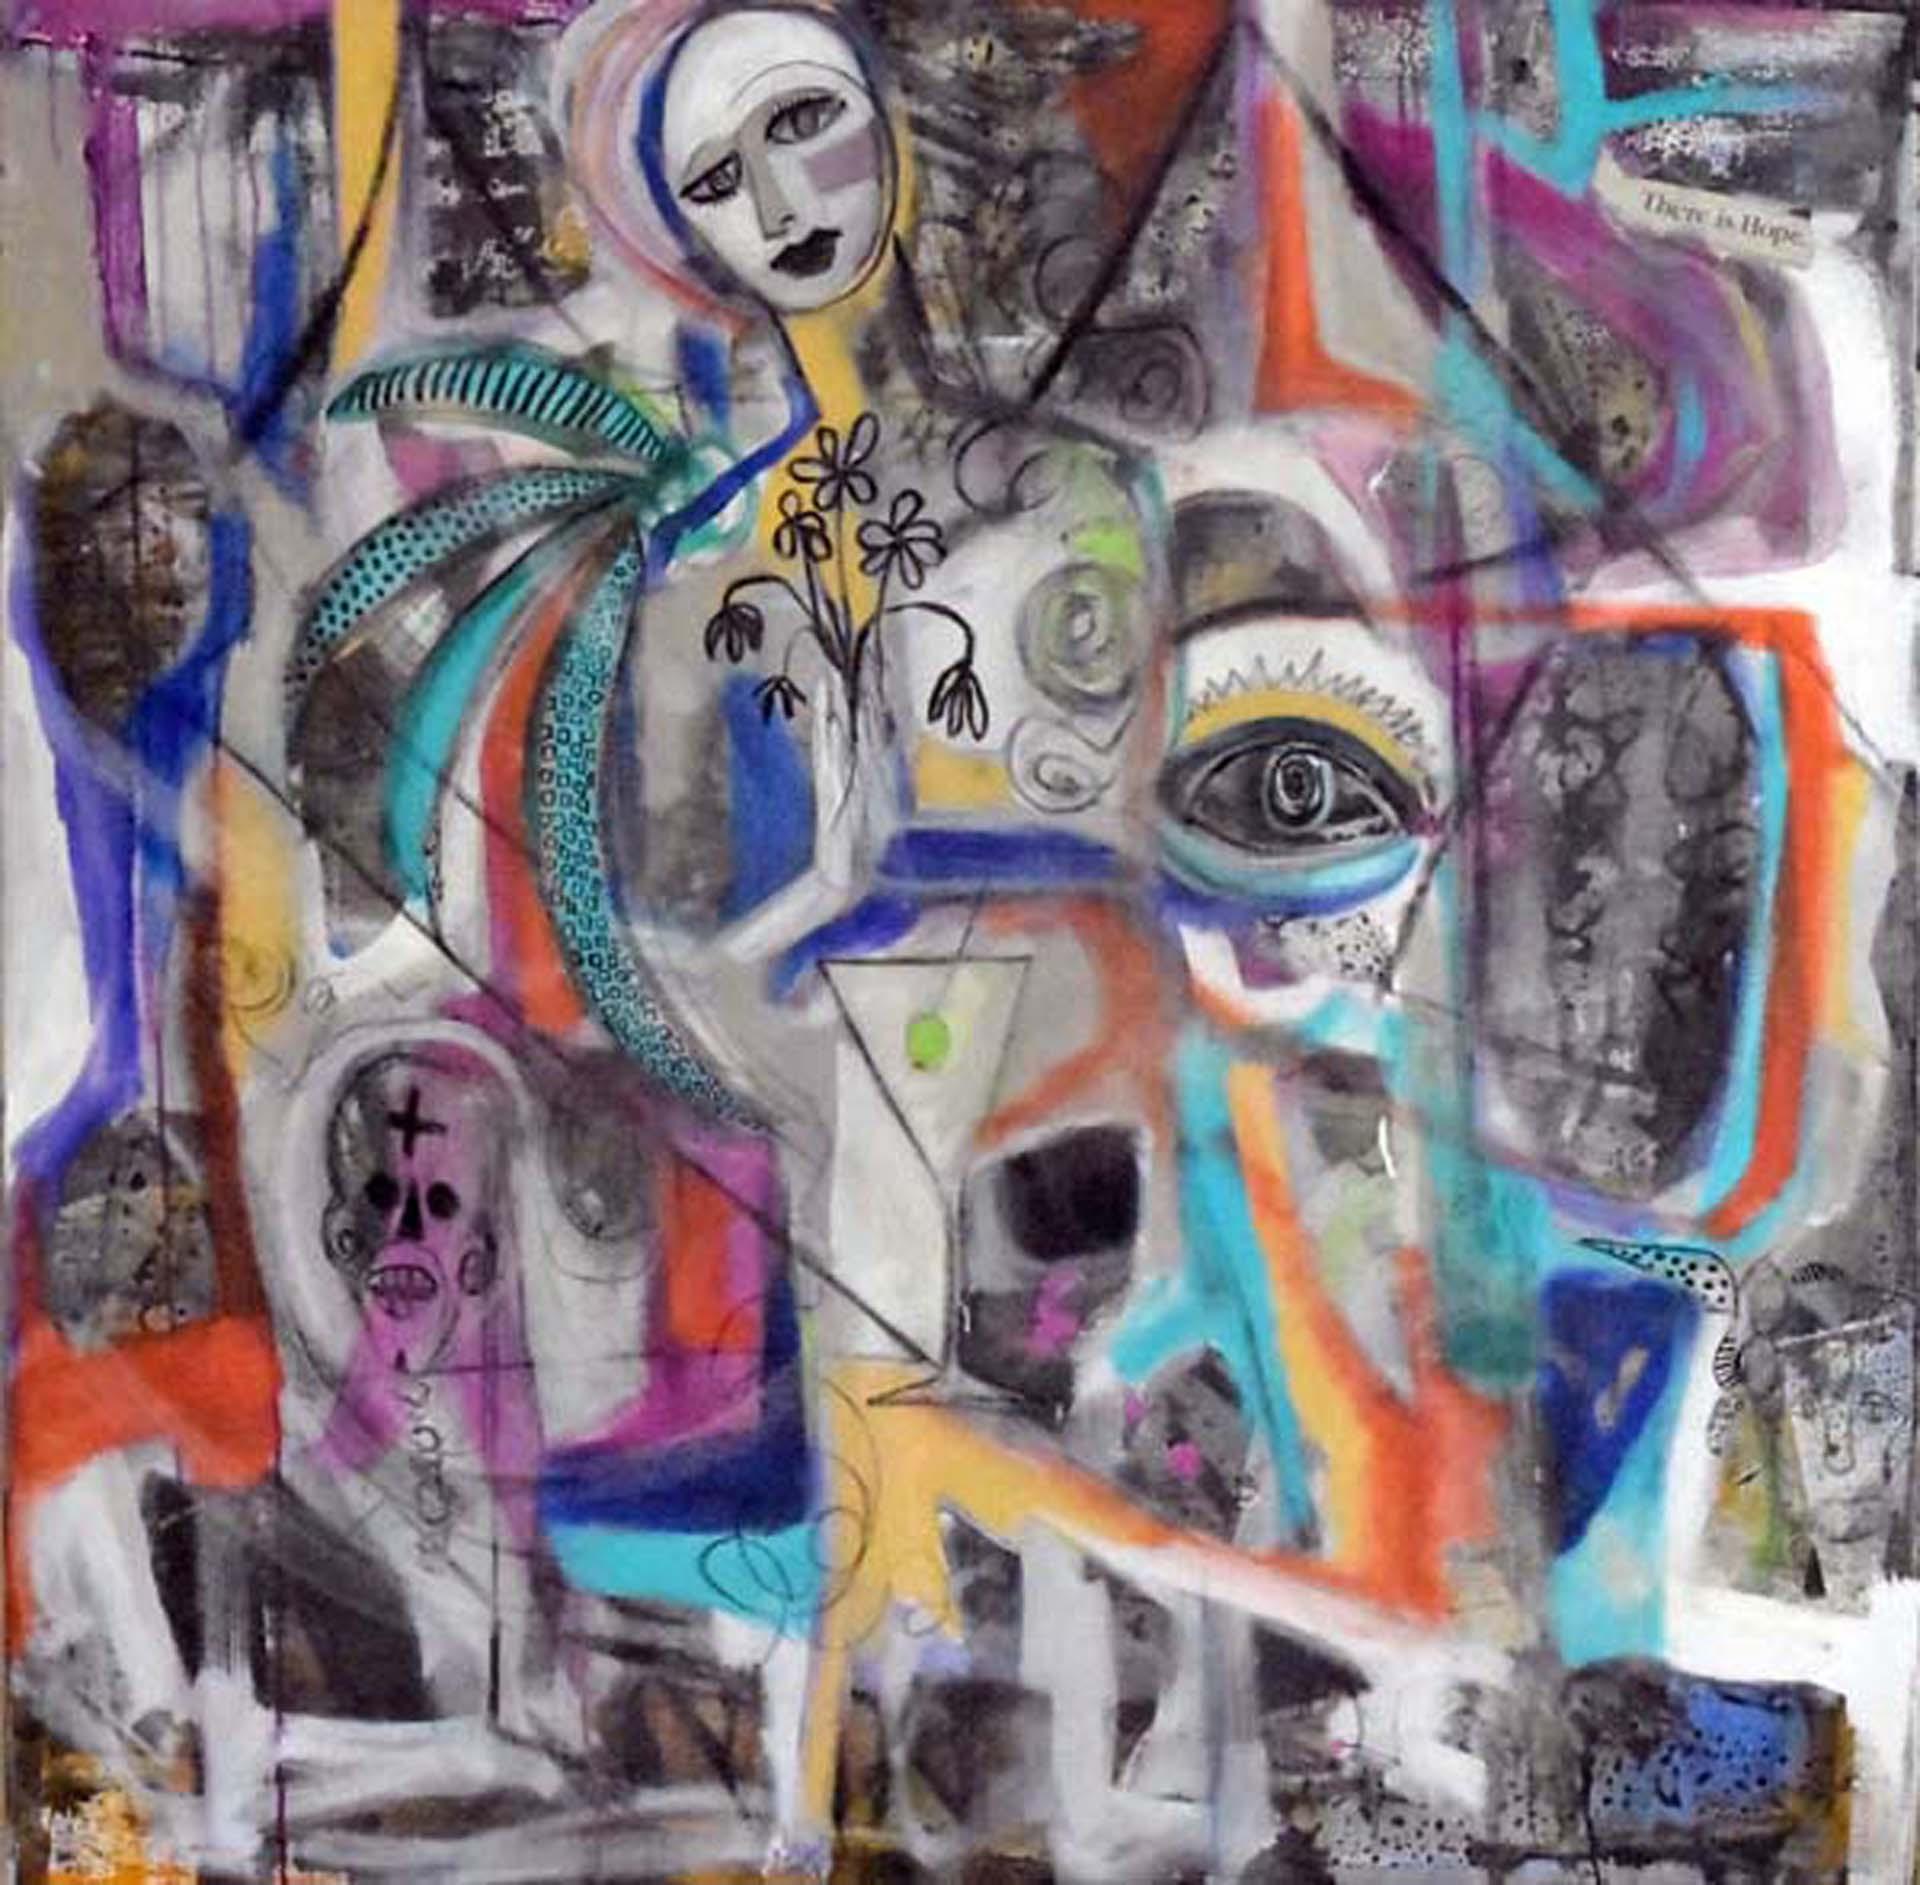 Deveuvealexis street art madonna 50 x50  mixed media on canvas abazdm